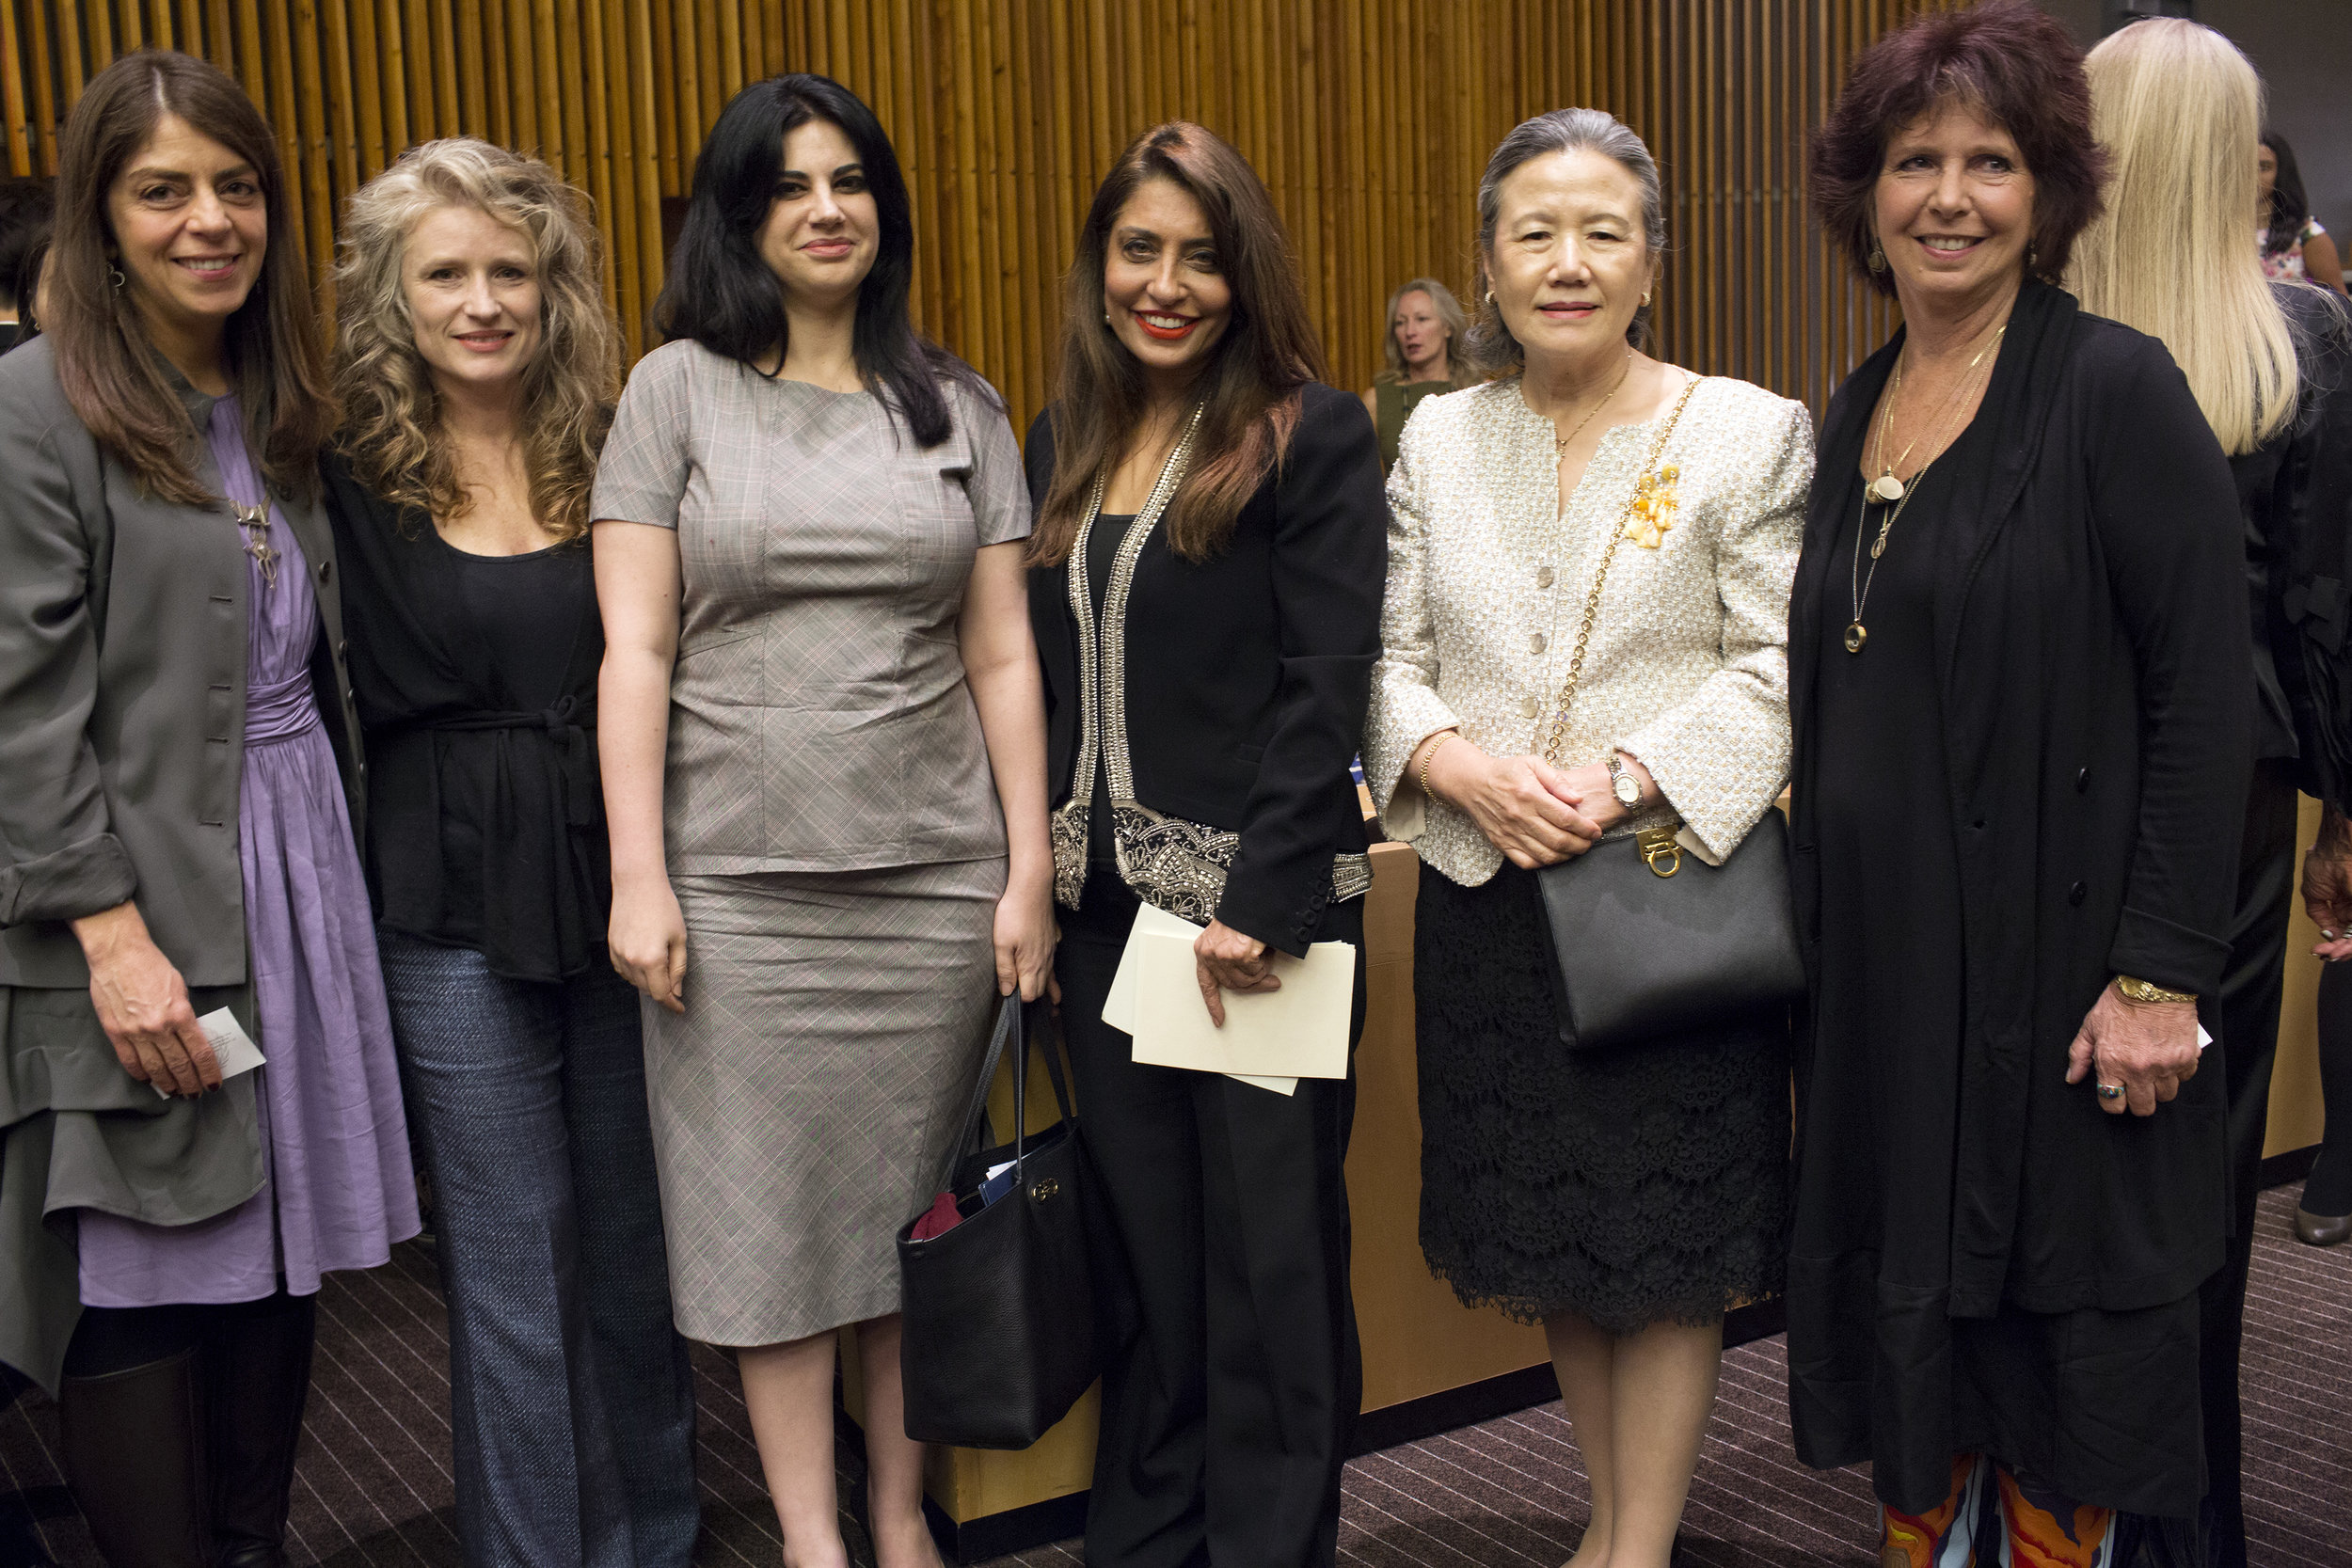 Ban Soon-taek  stands for a photo with Nancy Abraham, filmmaker Cynthia Hill, Elizabeth Flores U.N. Ambassador of Honduras, Muna Rihani Al-Nasser, and (far right) Kit Gruelle.JPG